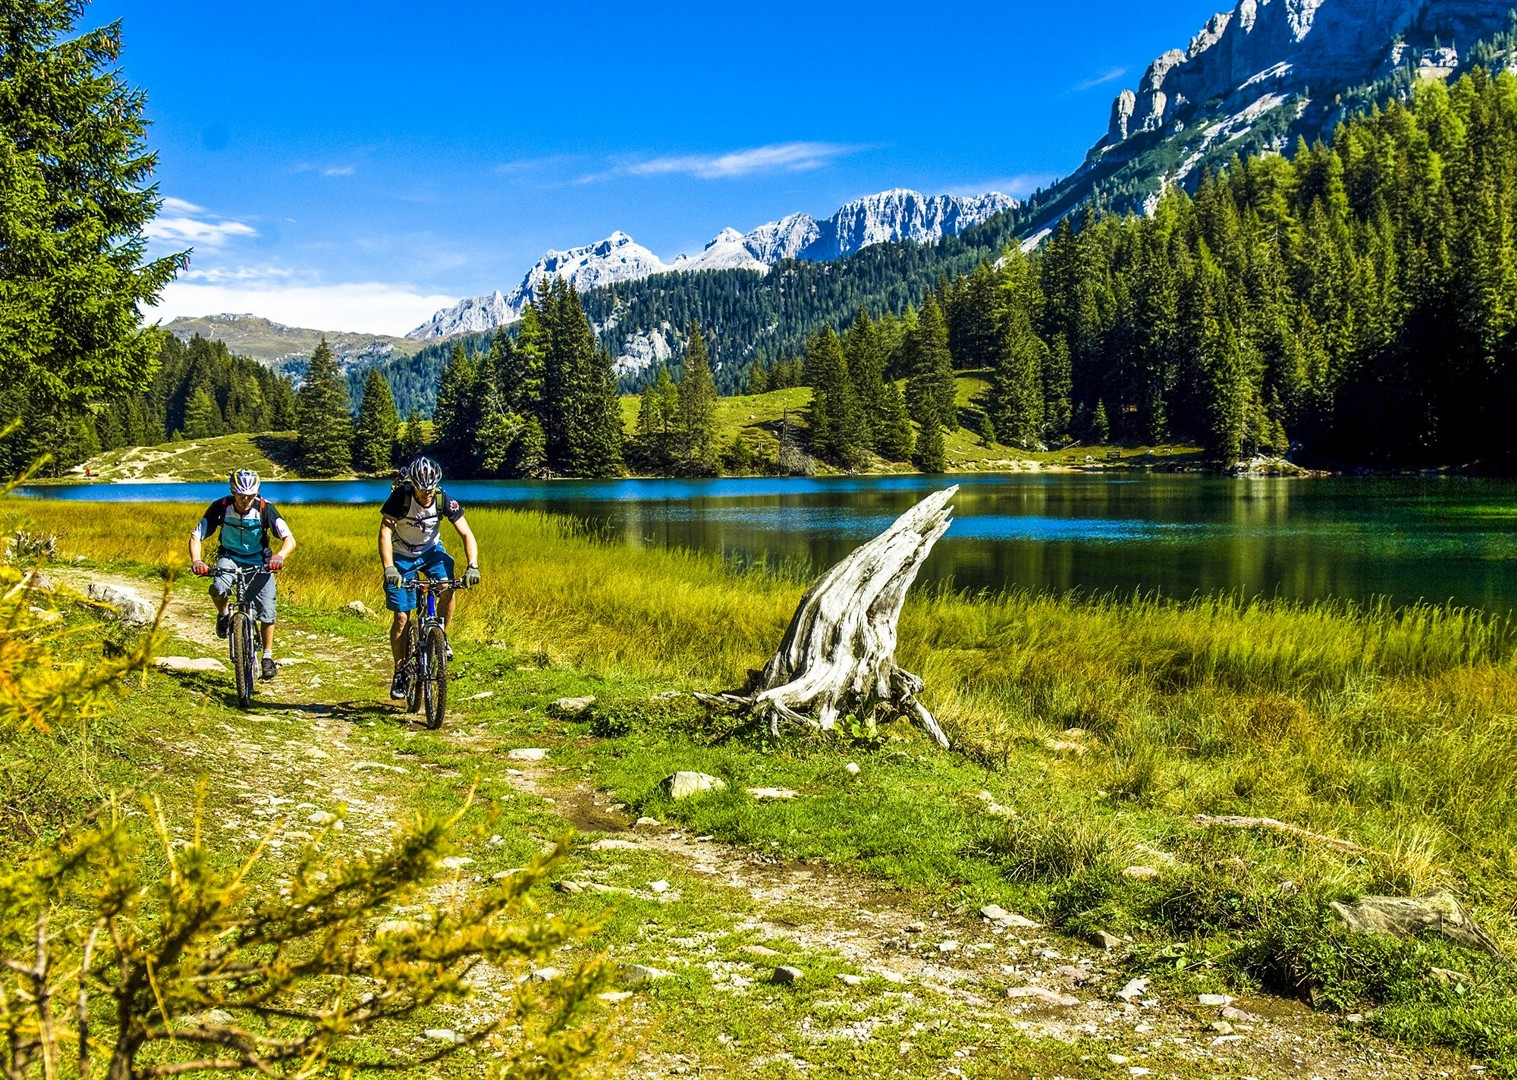 Brenta_Bike_2007_109-2.jpg - Italy - Dolomites of Brenta - Electric Mountain Bike Holiday - Mountain Biking